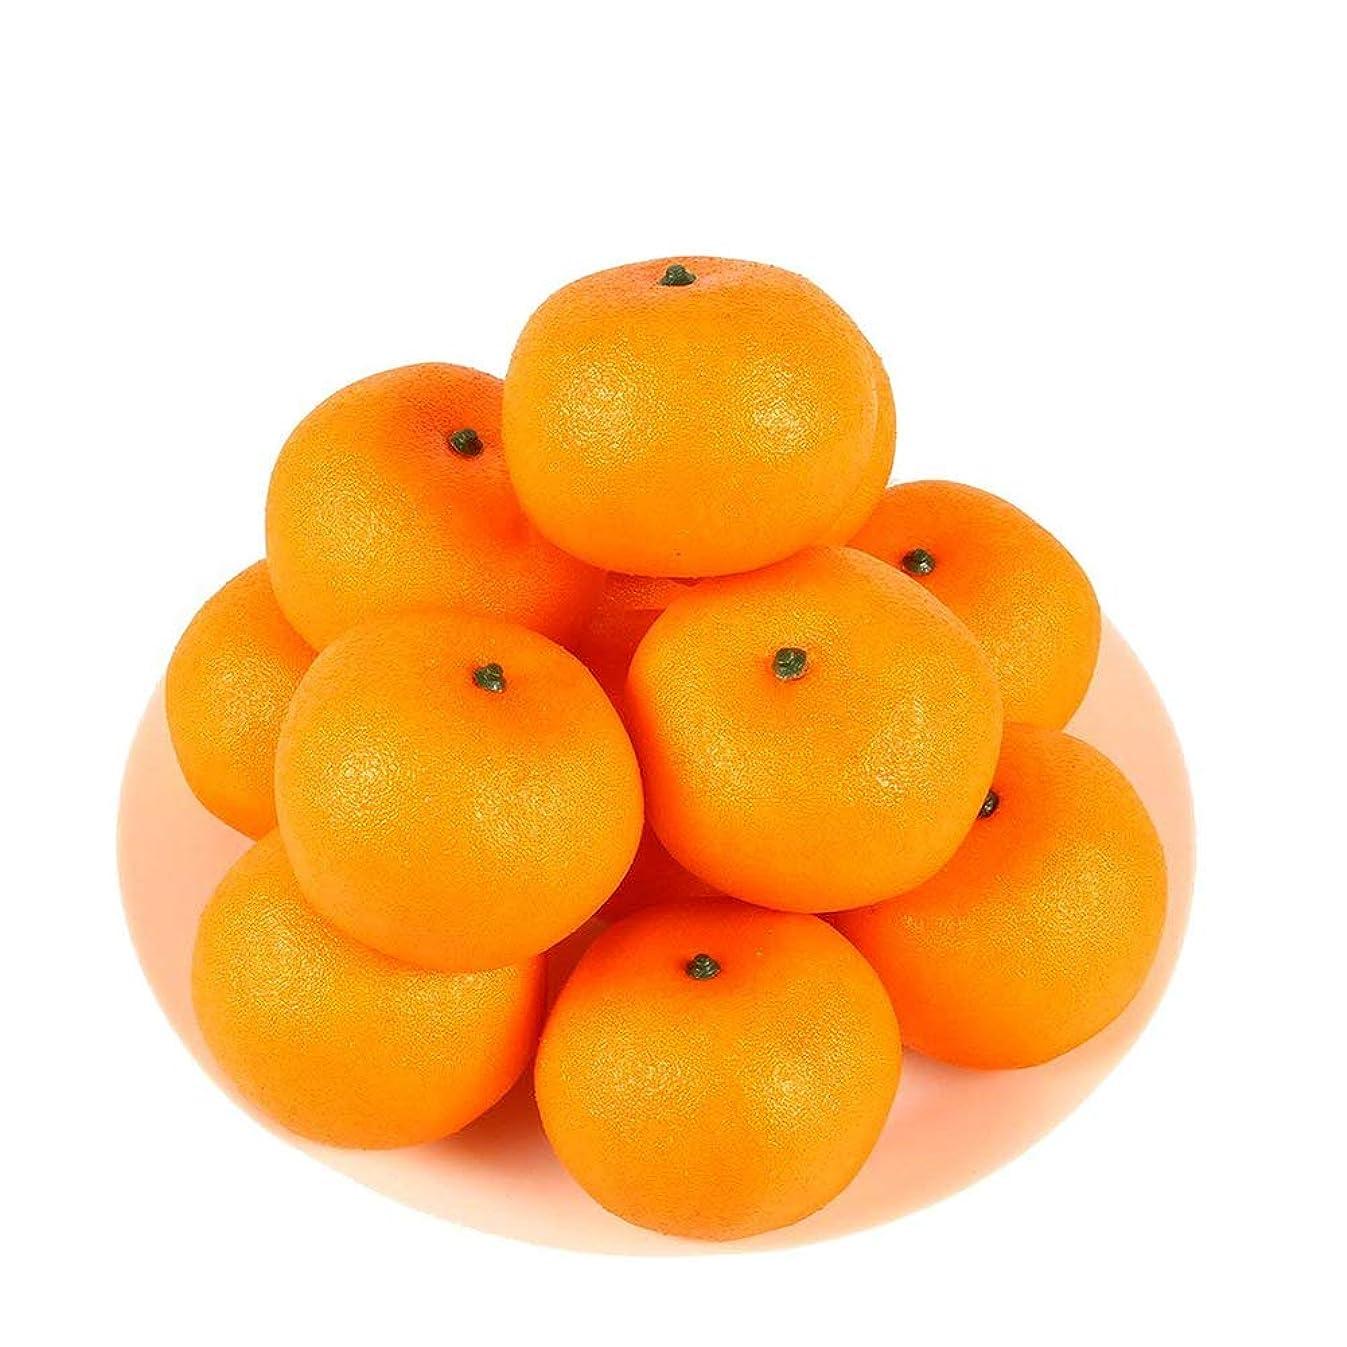 HAKSEN 12 PCS Artificial Lifelike Simulation Oranges Fake Fruit Home Kitchen Cabinet Decoration